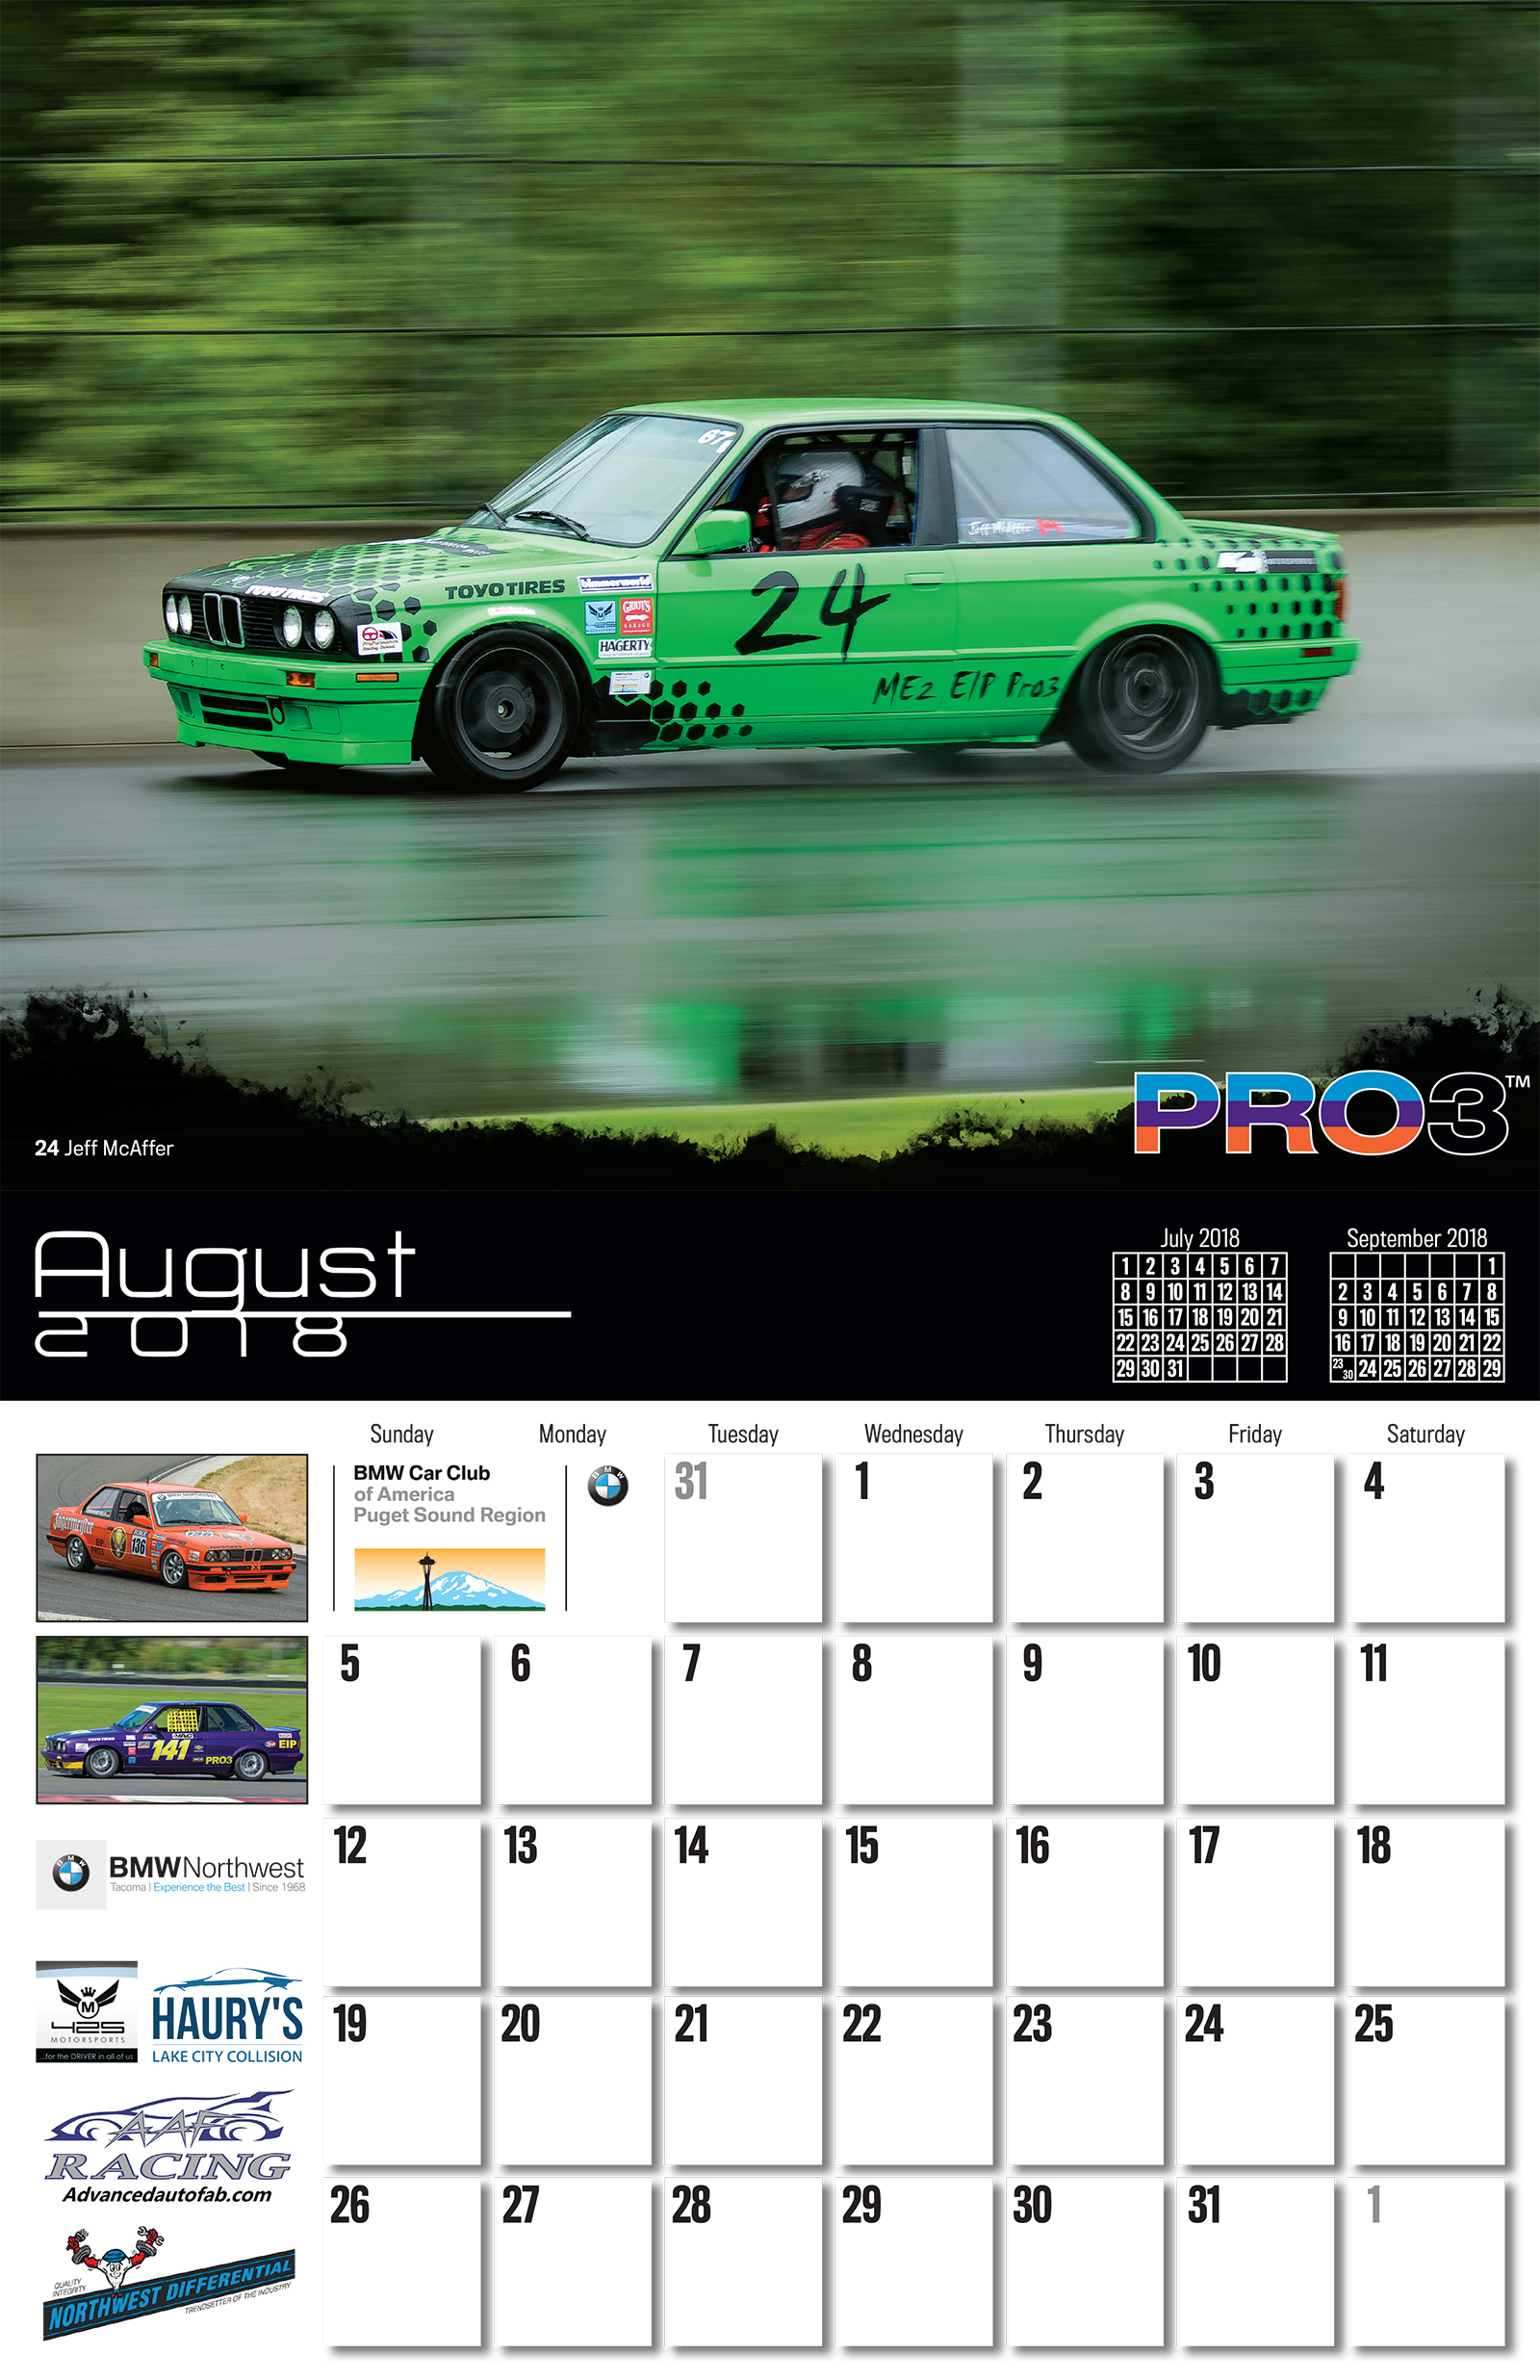 PRO3_Calendar_2018_08-Aug.jpg